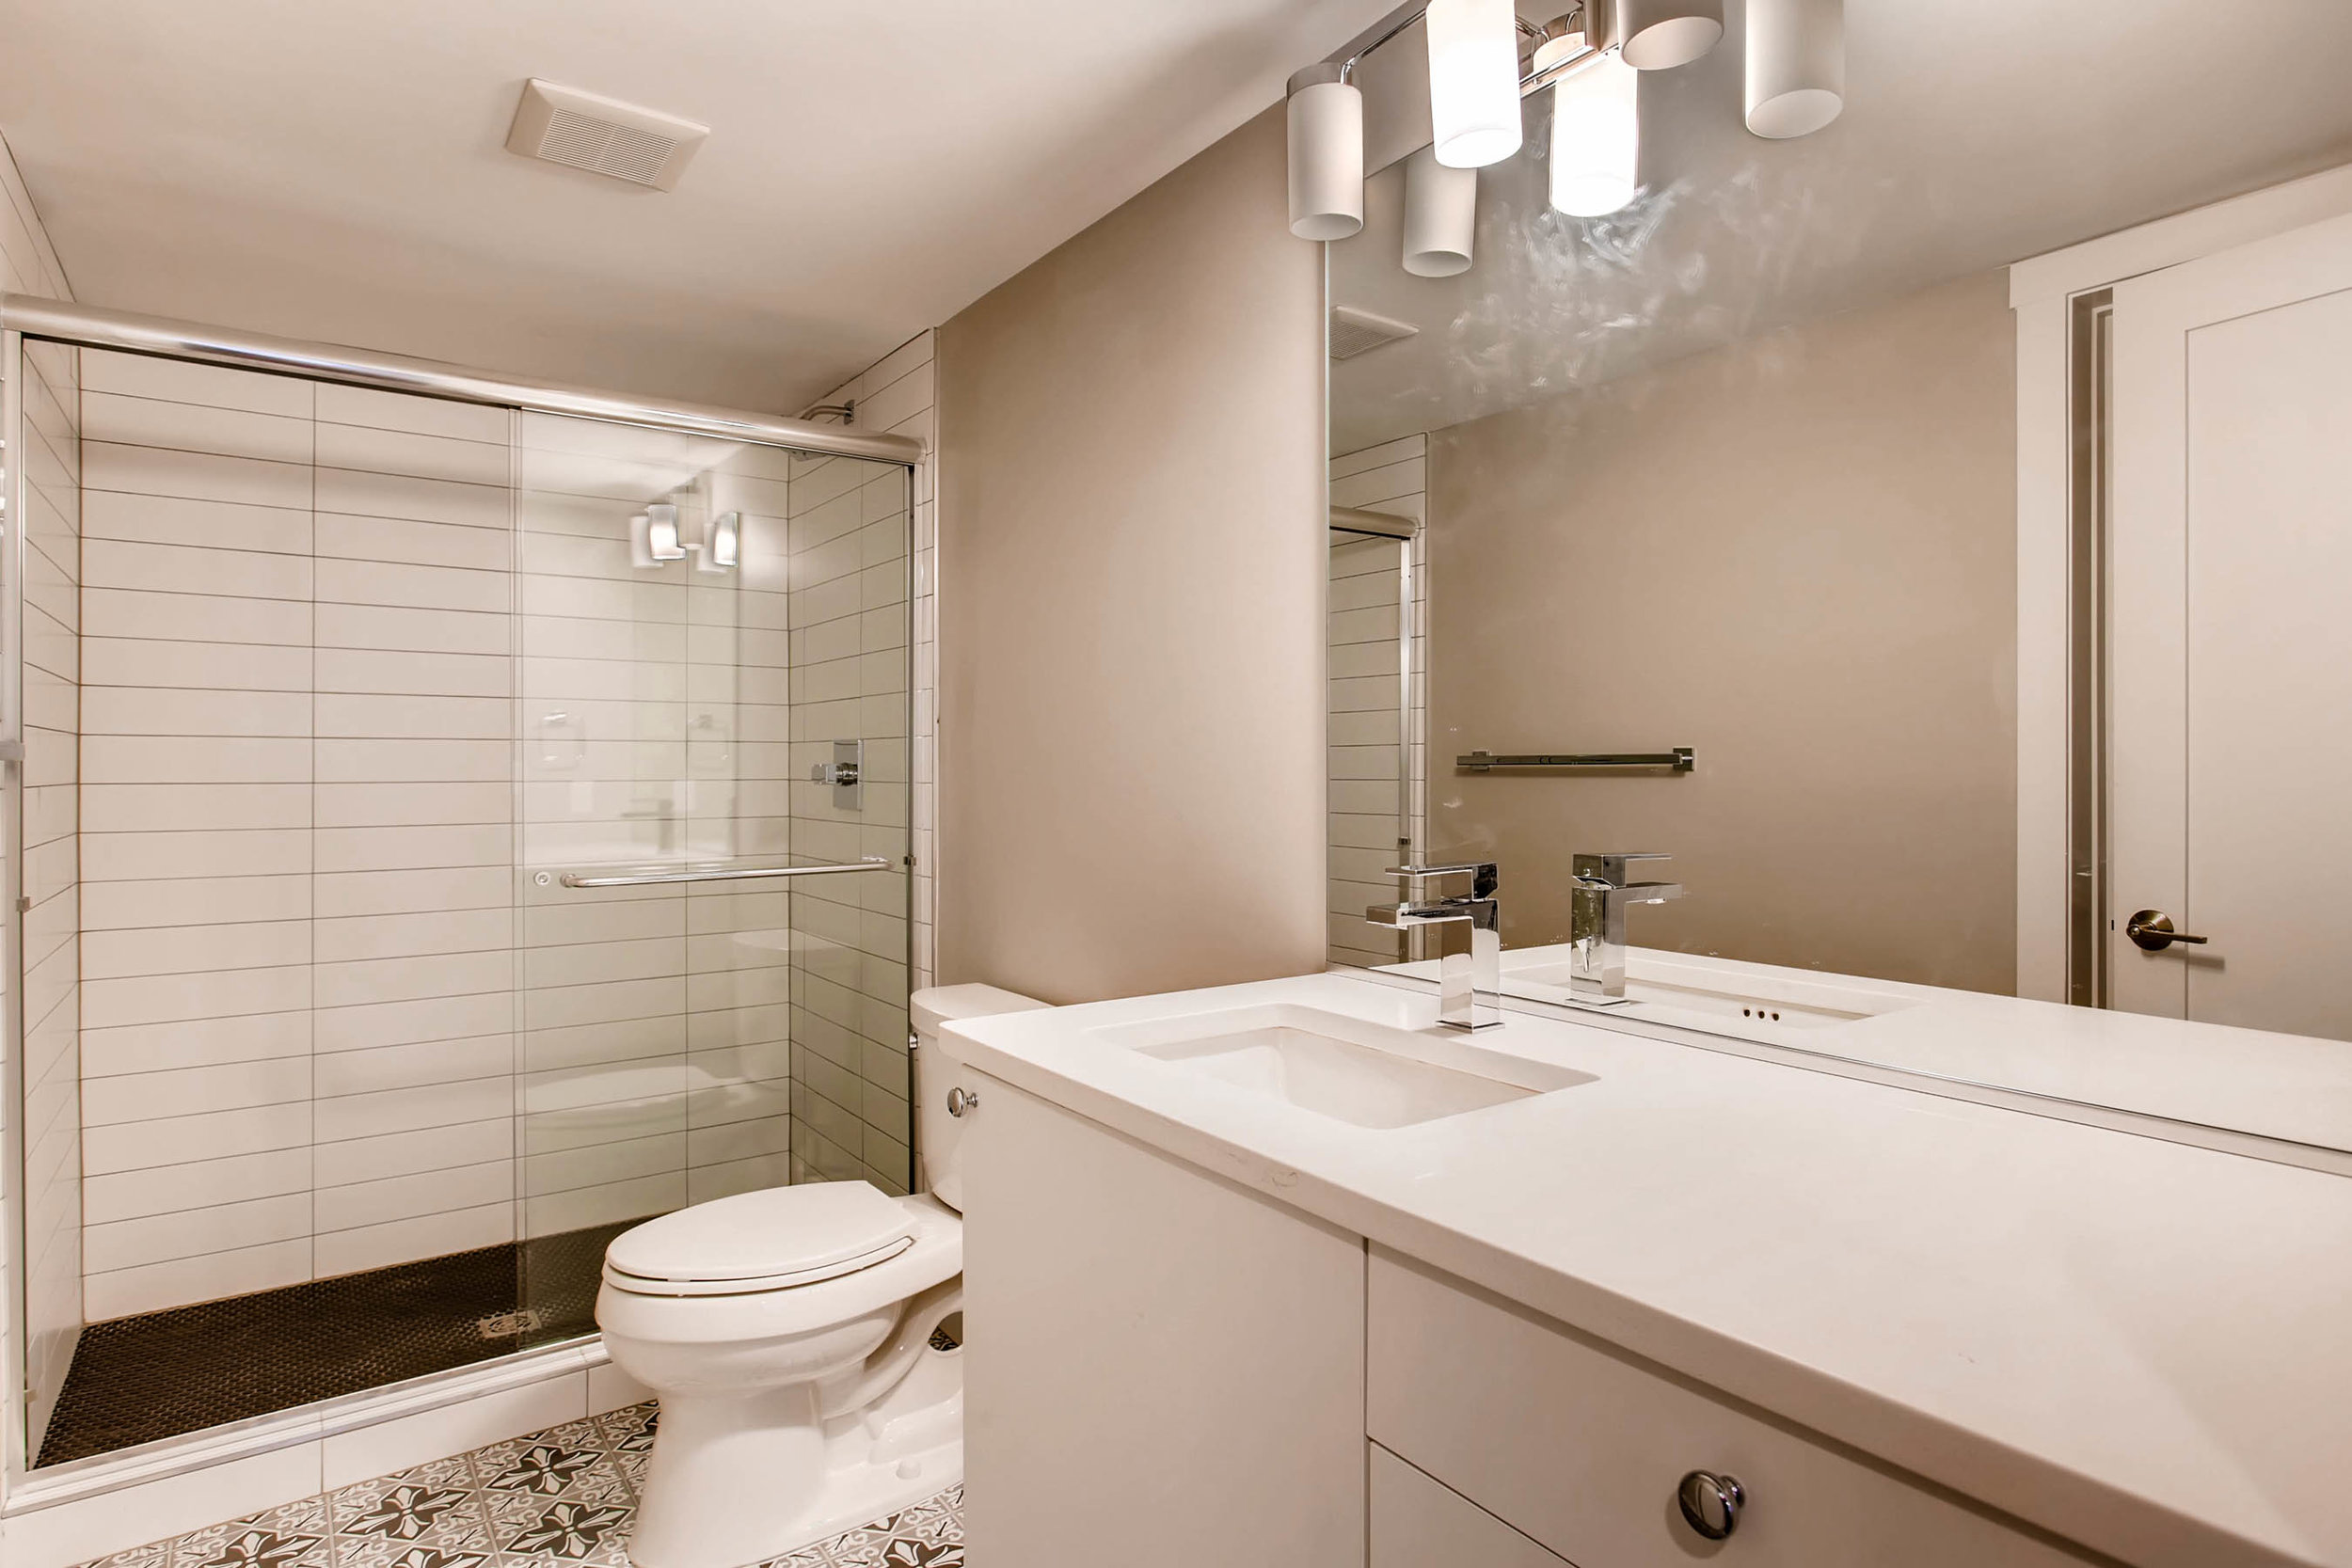 3050 Tennyson Denver CO 80212-print-025-12-Lower Level Bathroom-2700x1800-300dpi.jpg